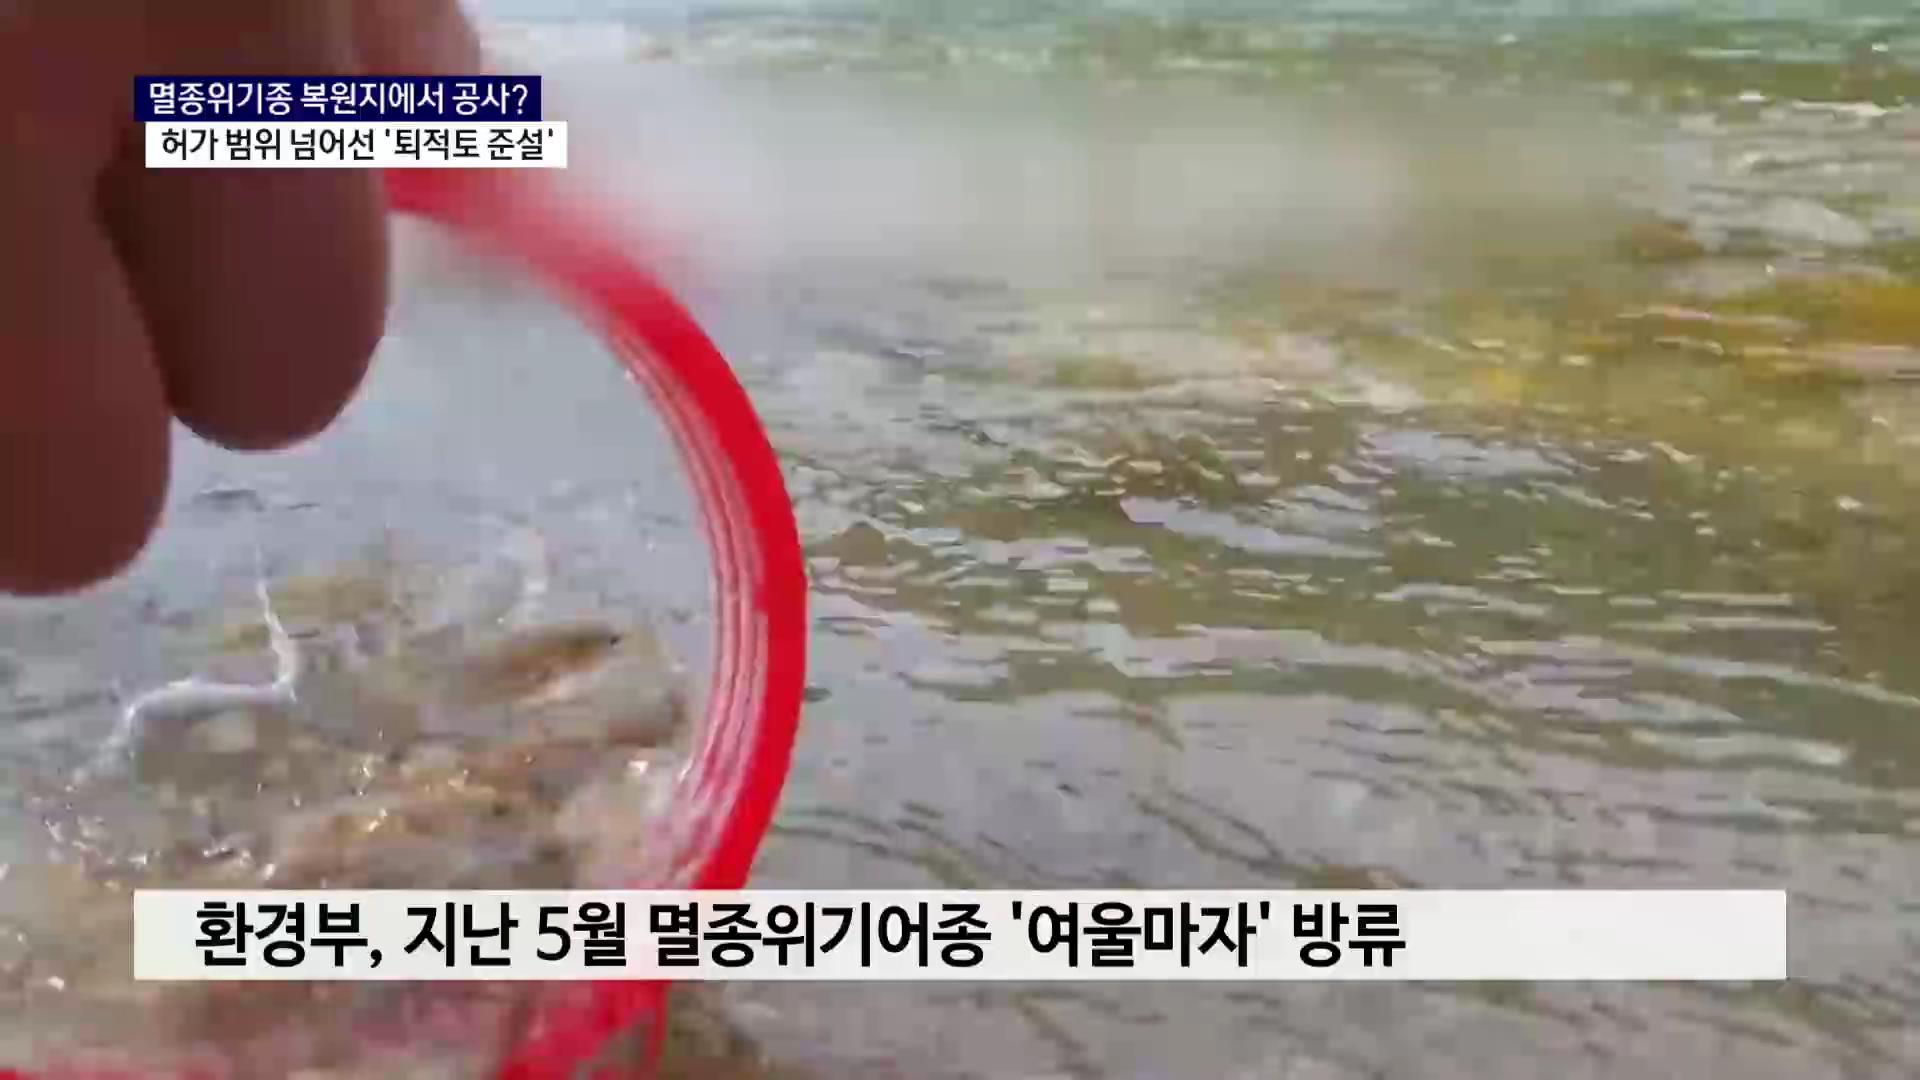 (R) 멸종위기어종 복원지에서 퇴적토 준설..허가 범위도 넘어 사진